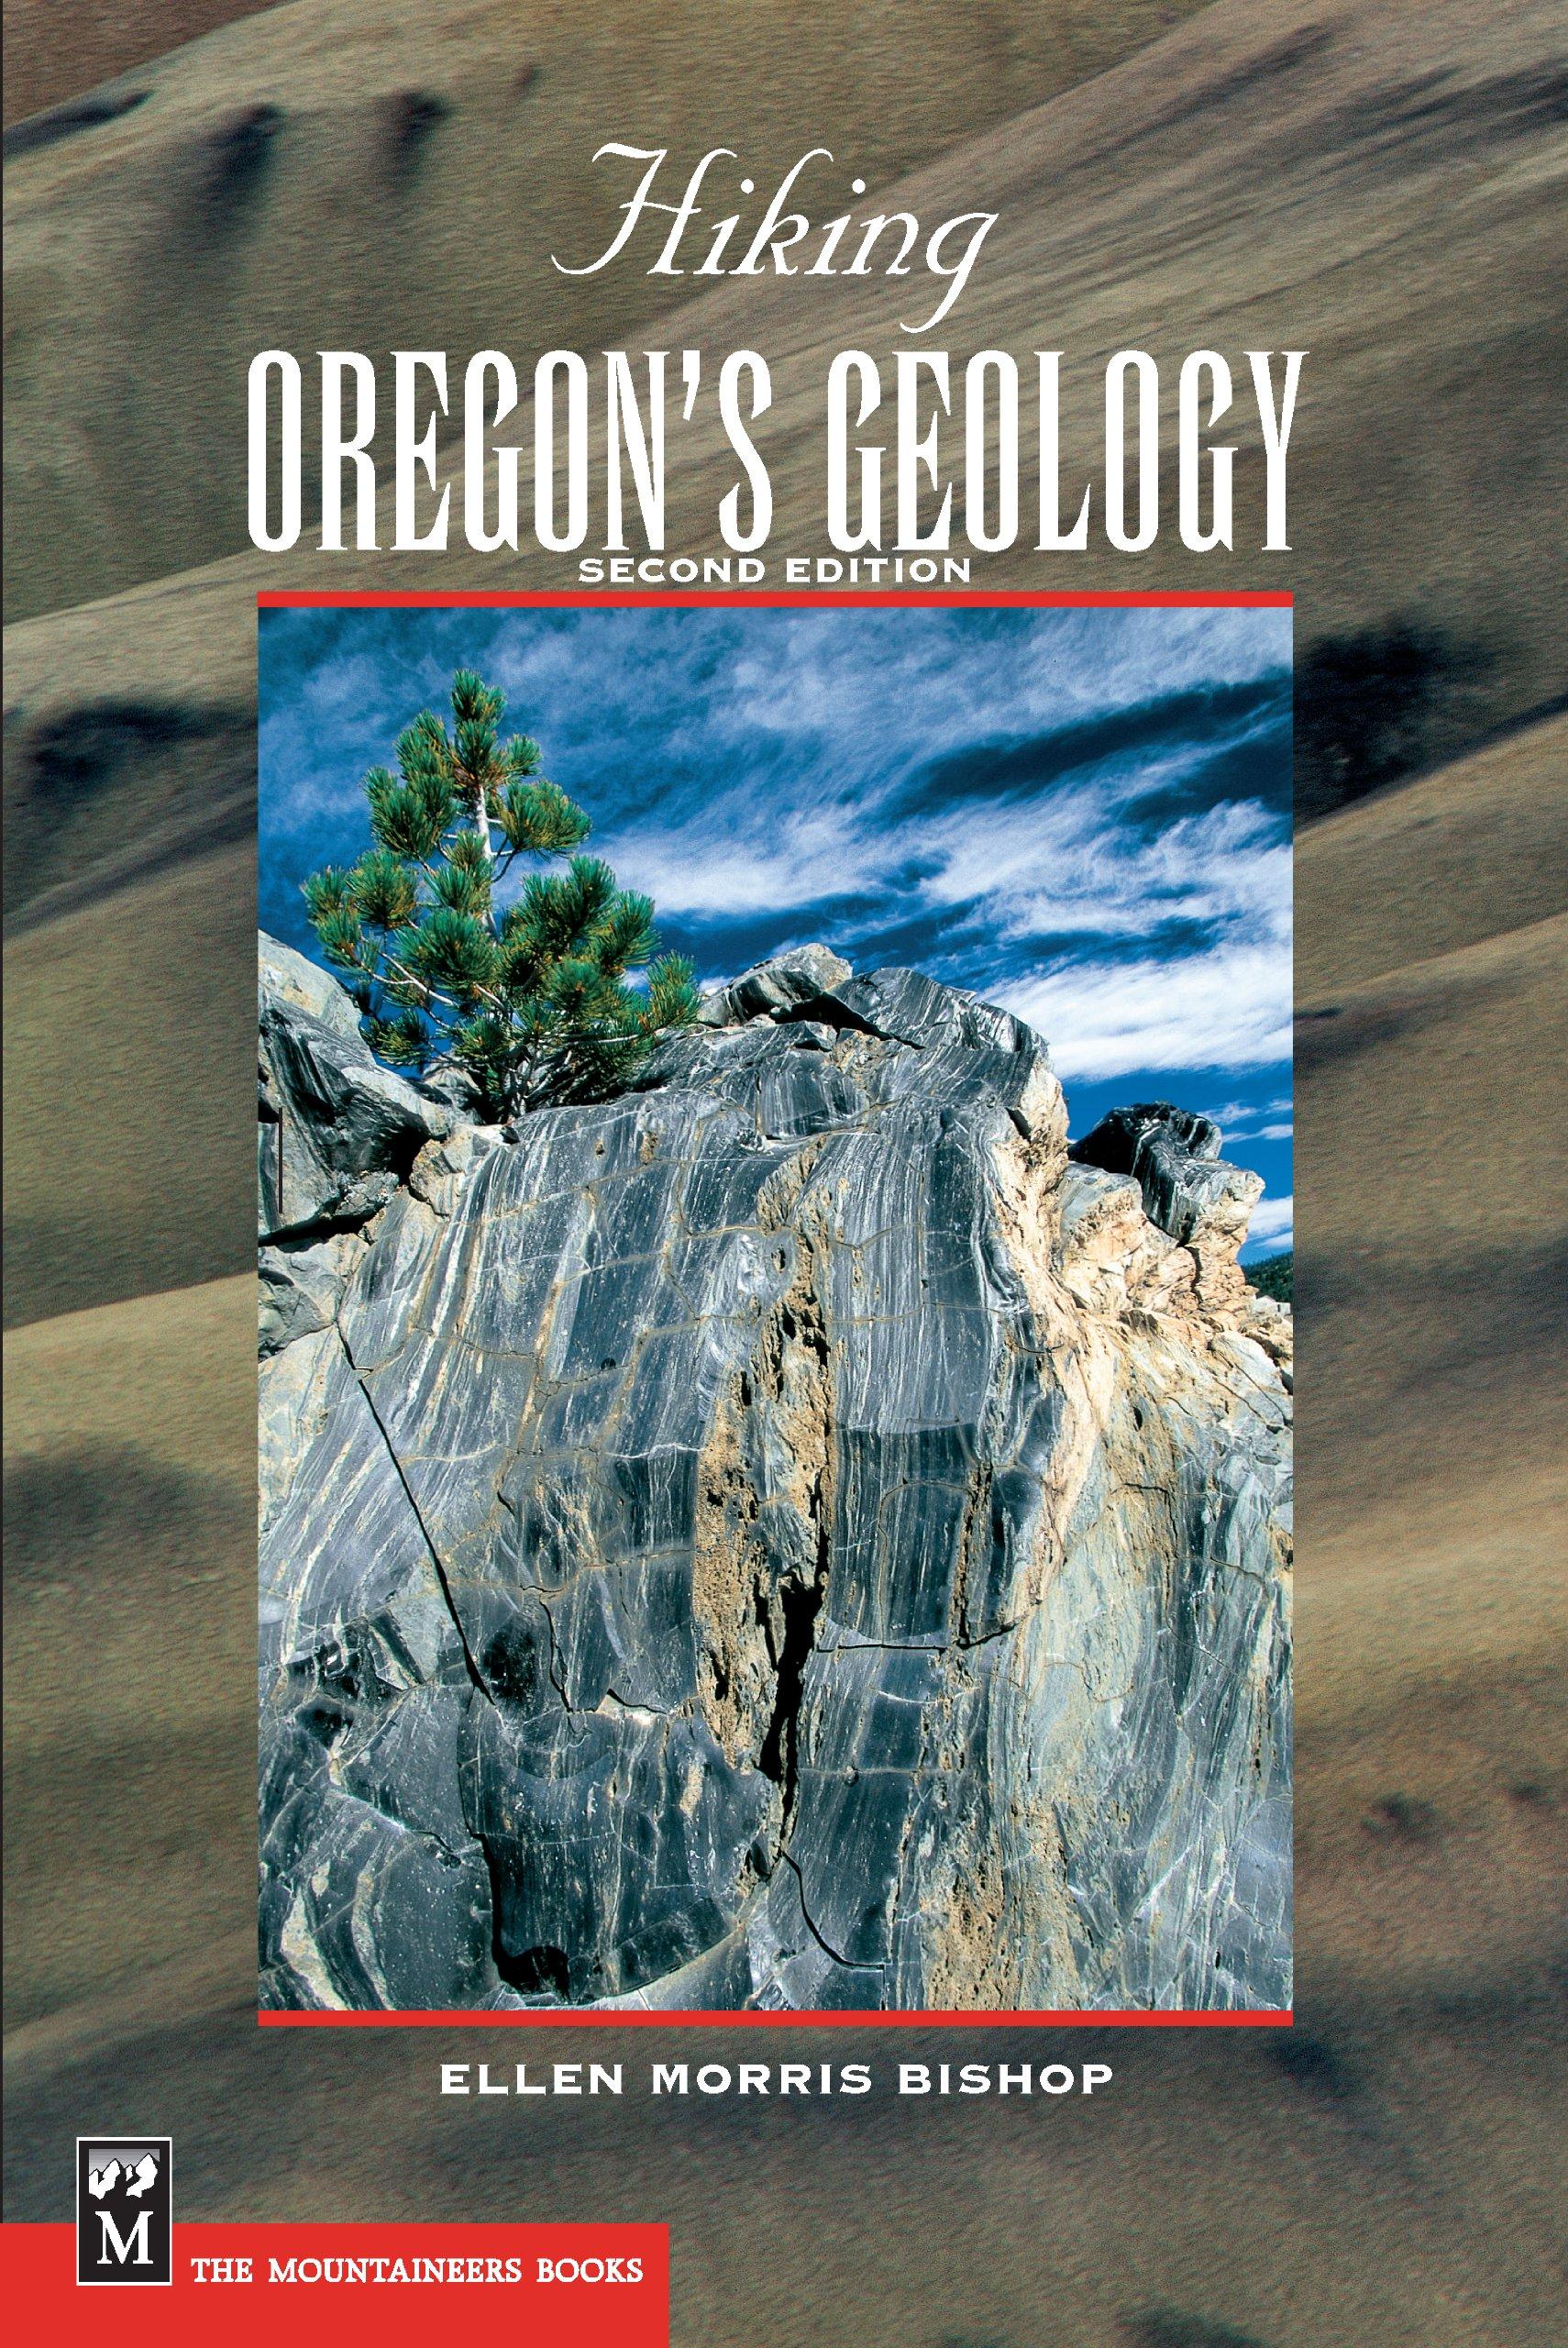 Hiking Oregons Geology John Eliot Allen Ellen Nikewallowashoeexplodedviewdiagramjpg Morris Bishop 9780898868470 Books